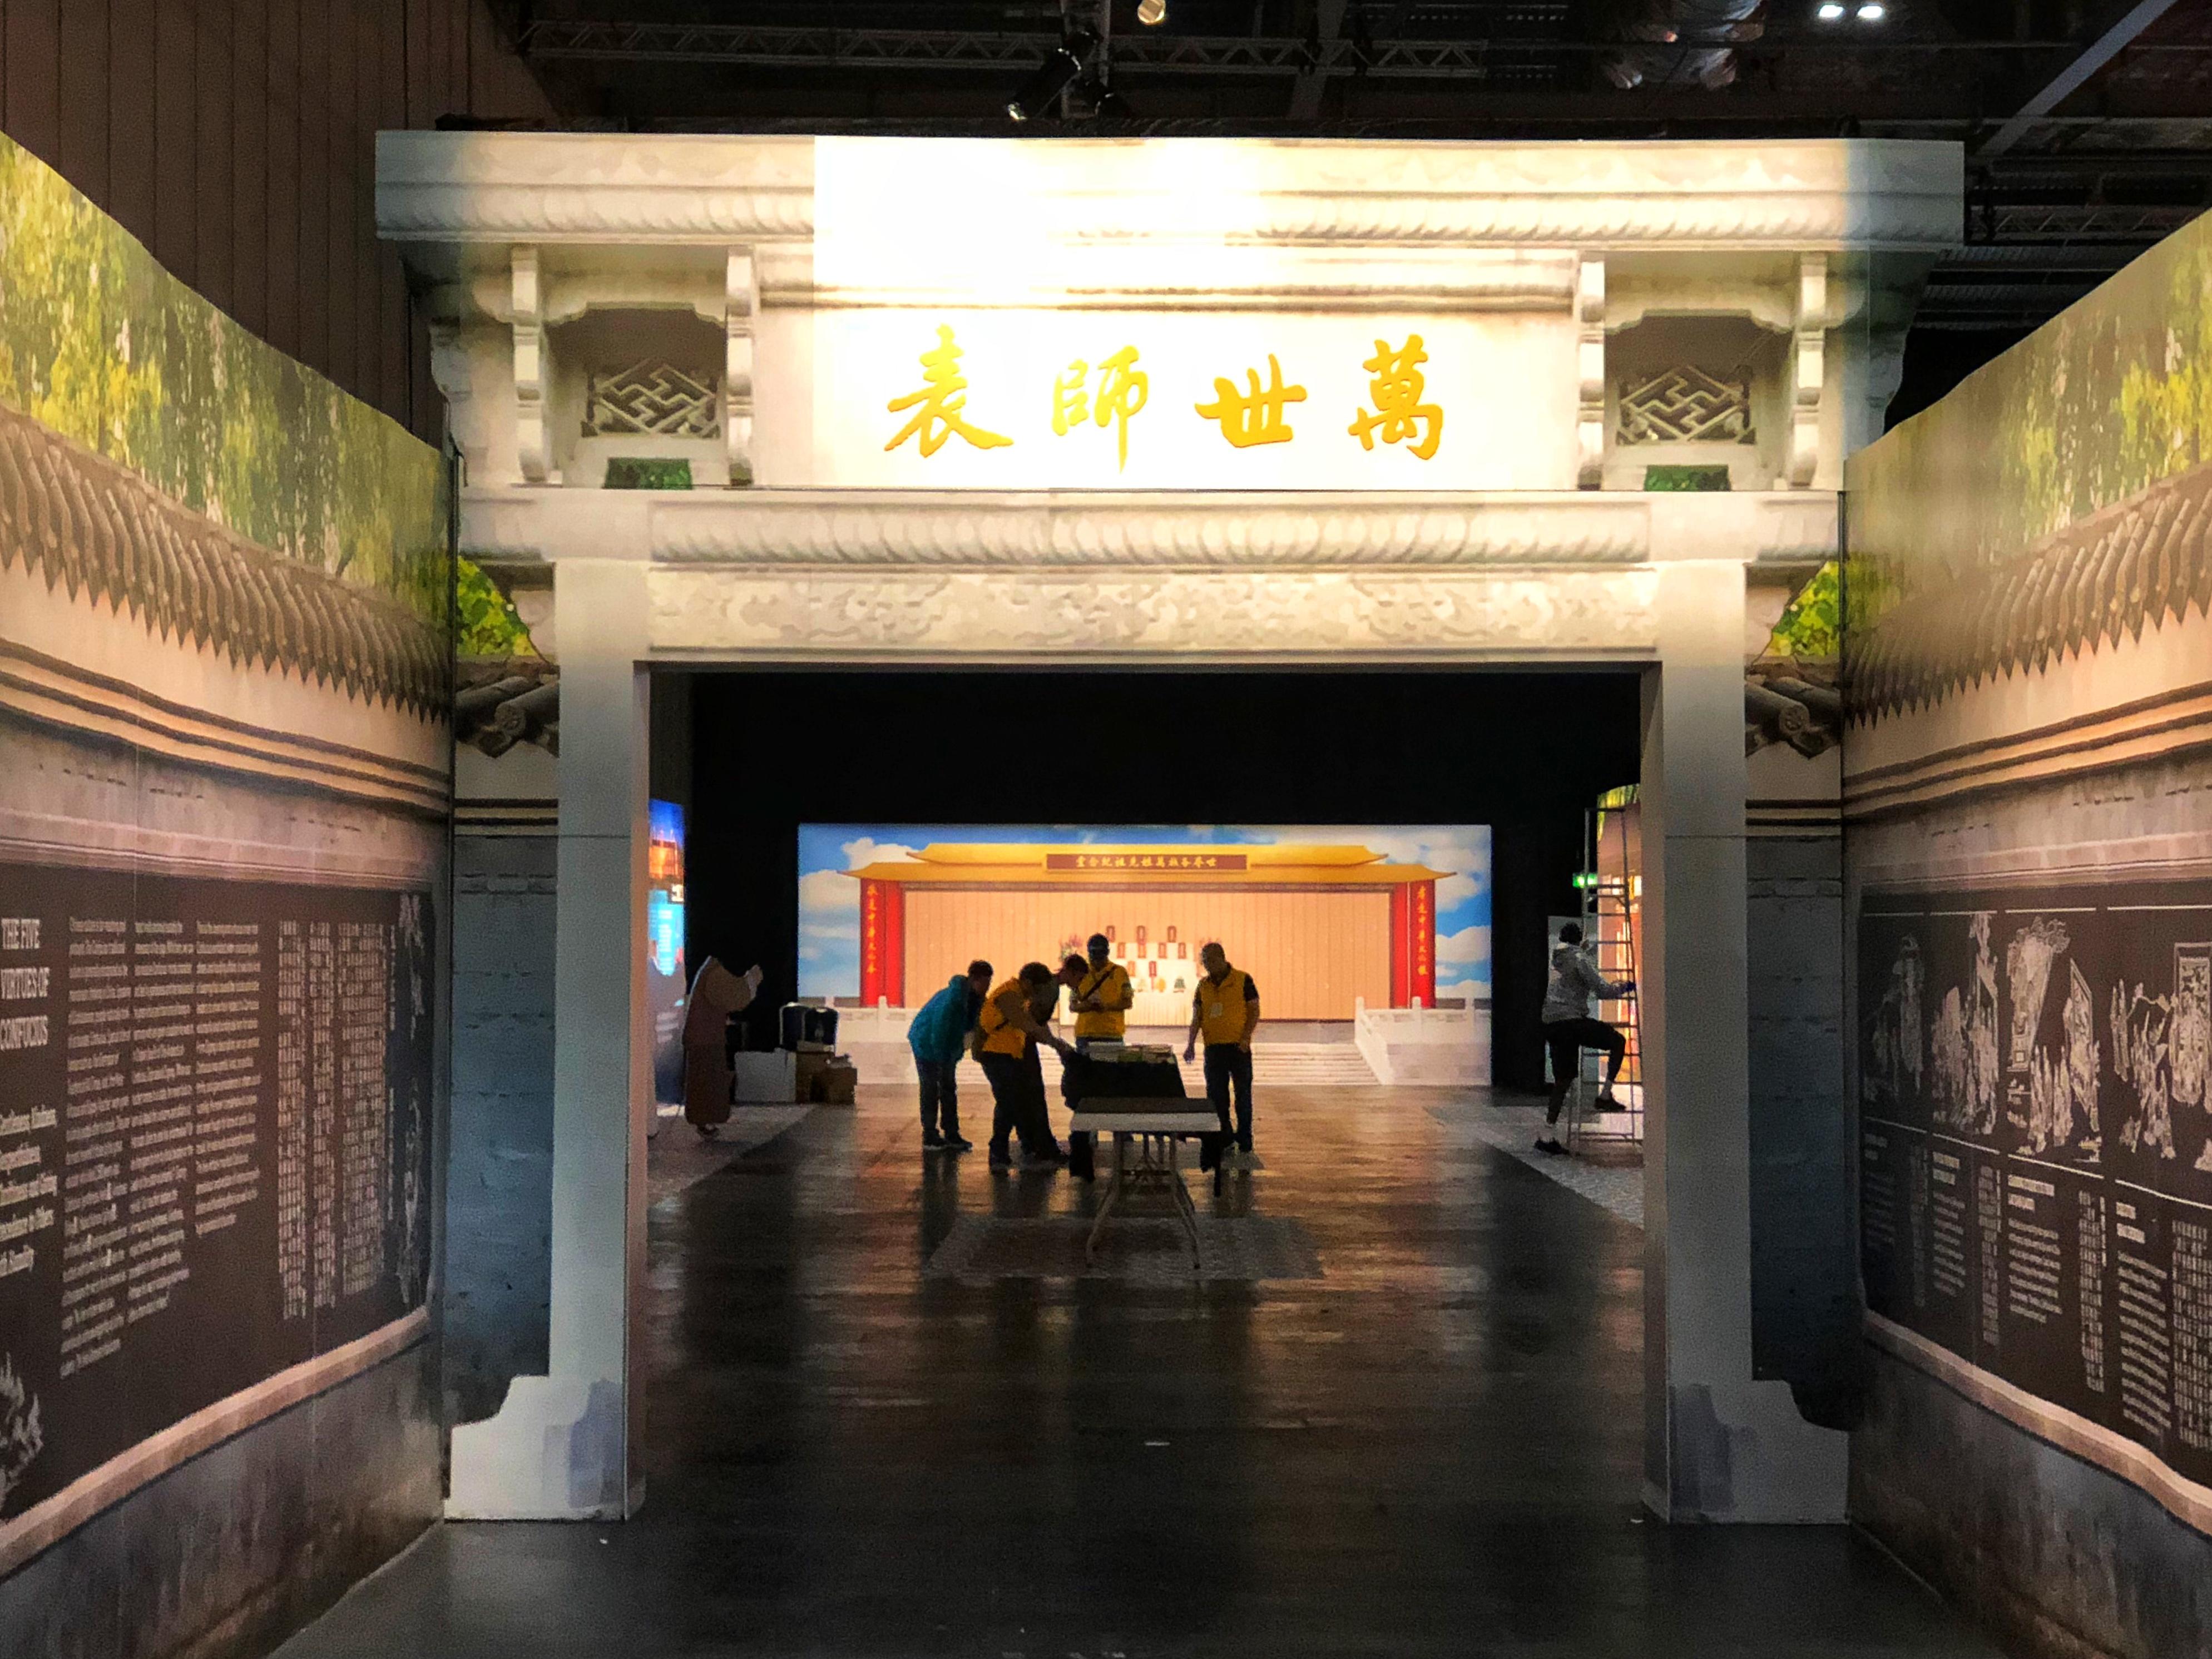 Exhibition display panels